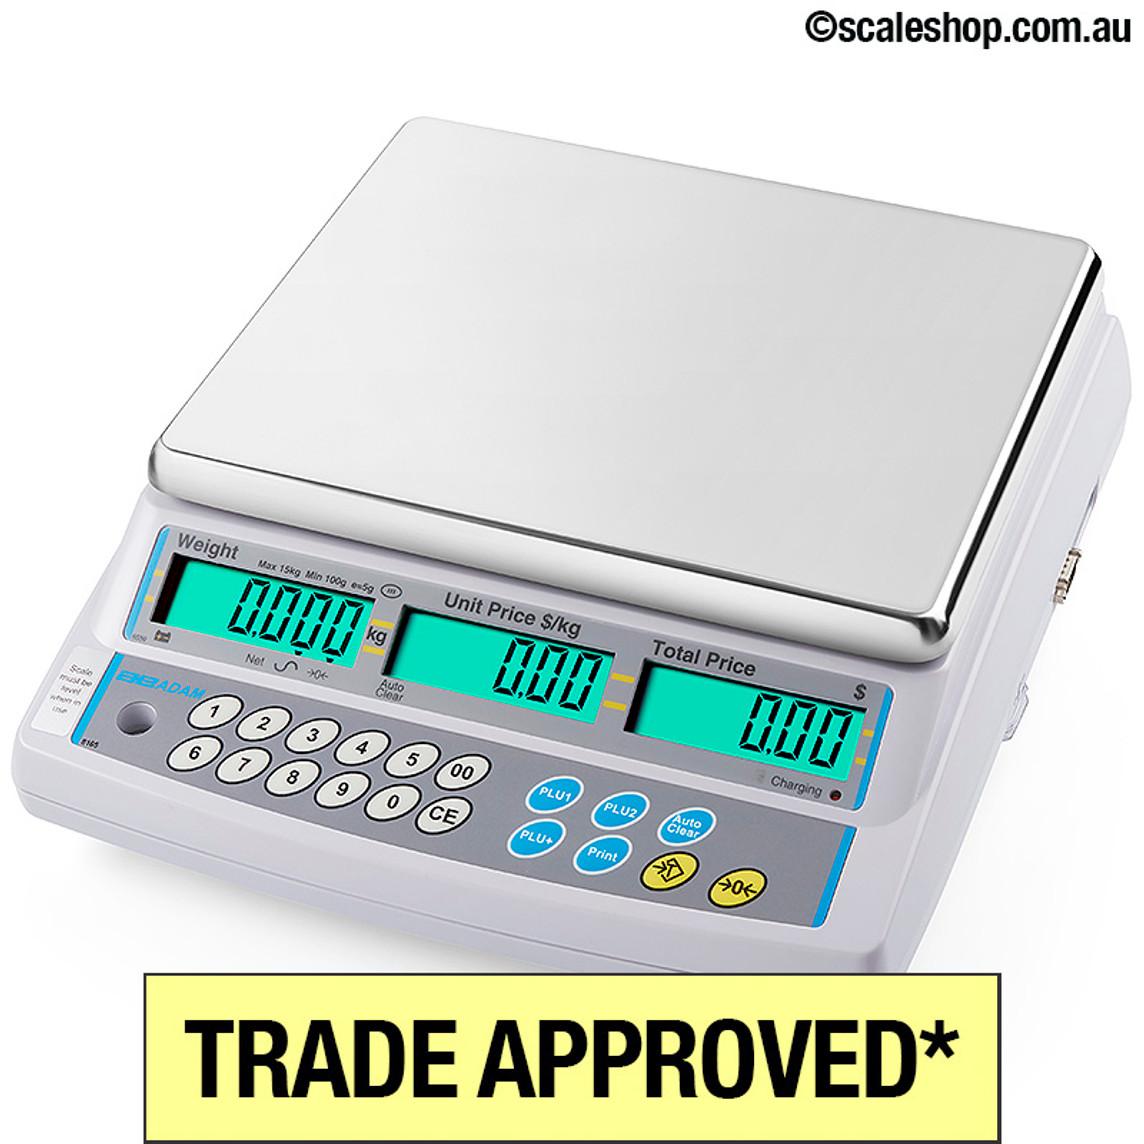 Adam AZ Extra Retail Scale Photo: ©The Scale Shop Australia